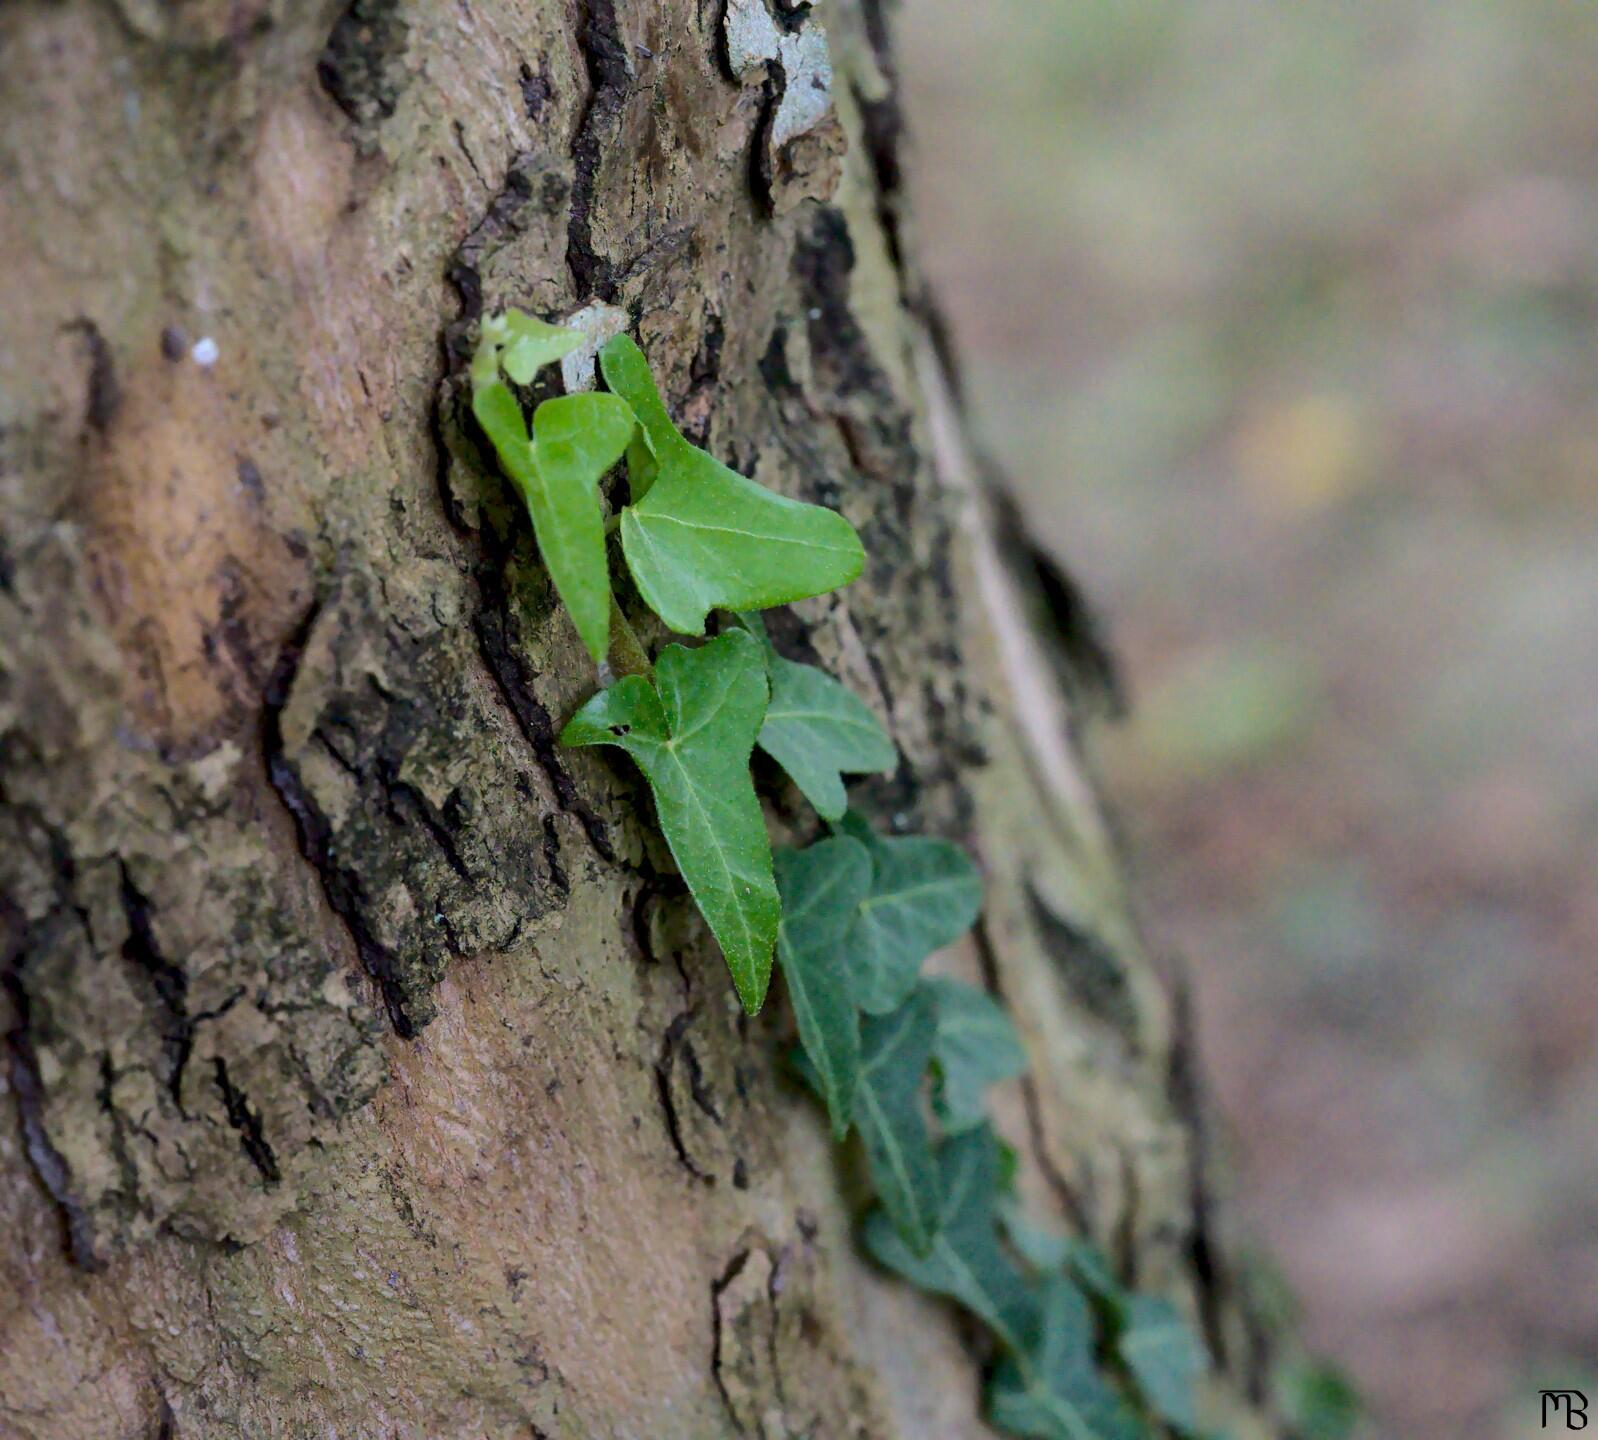 Green ivy on bark